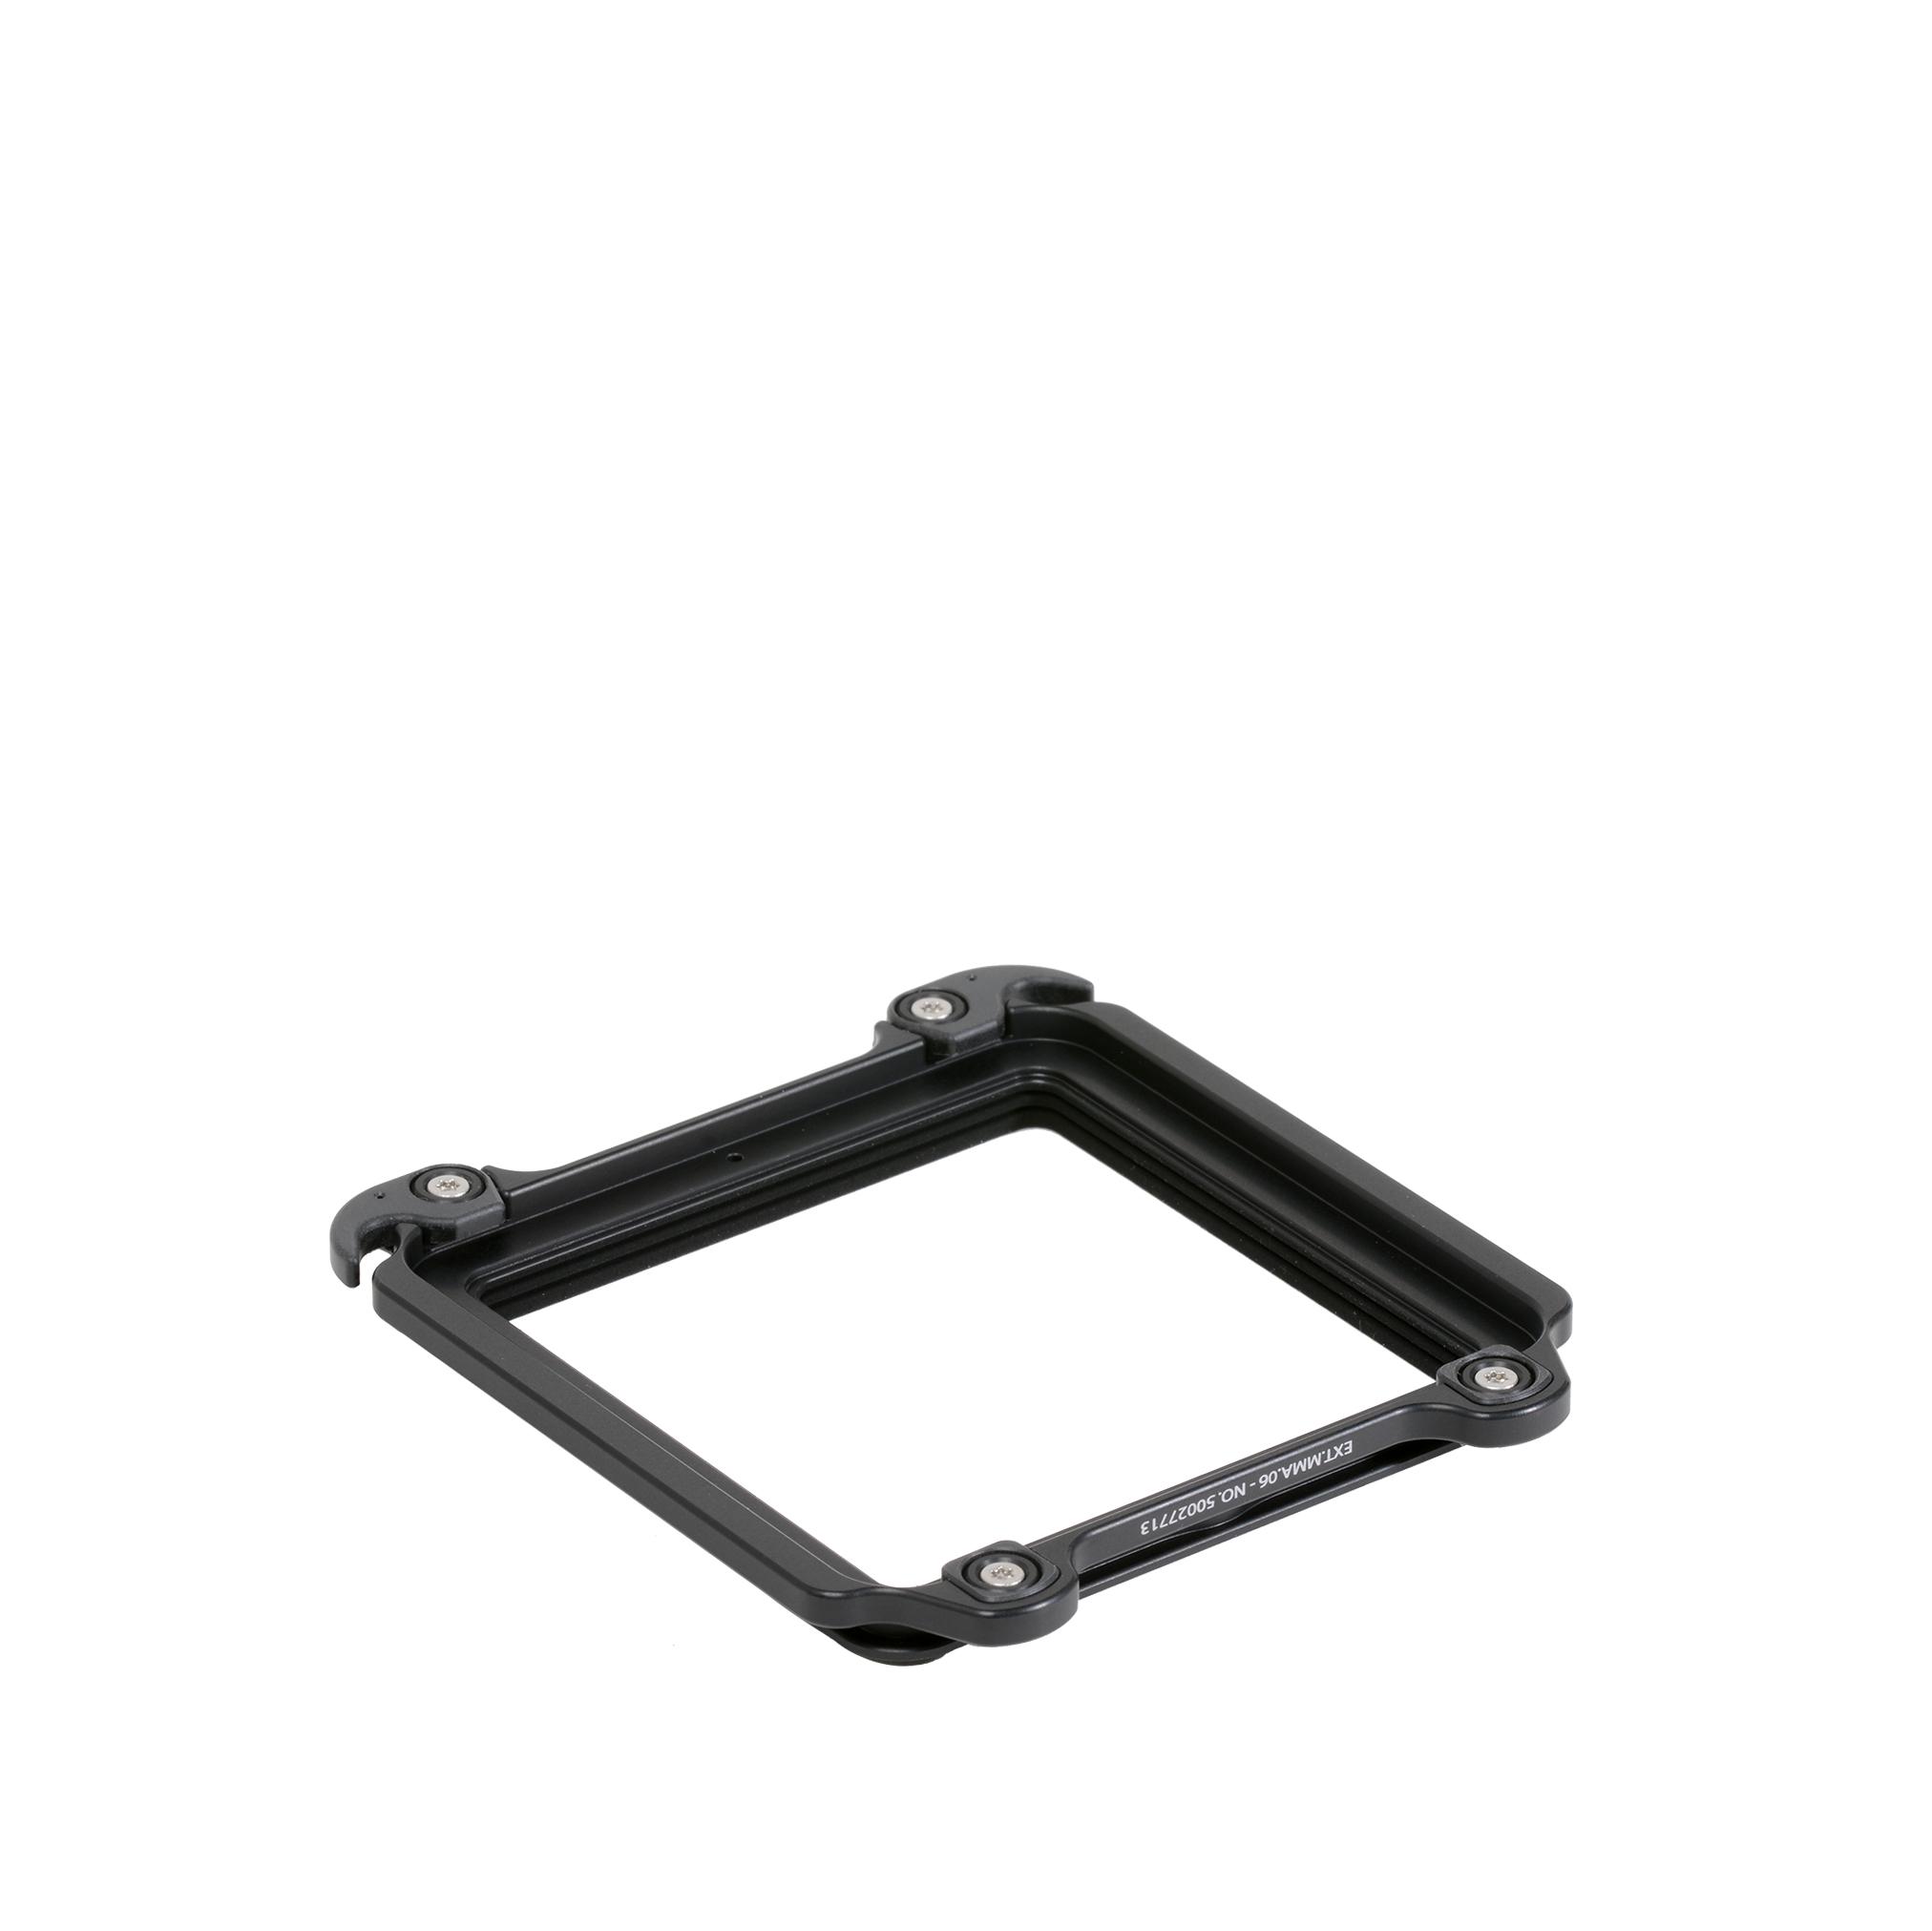 ALPA multi-use adapter, 6 mm